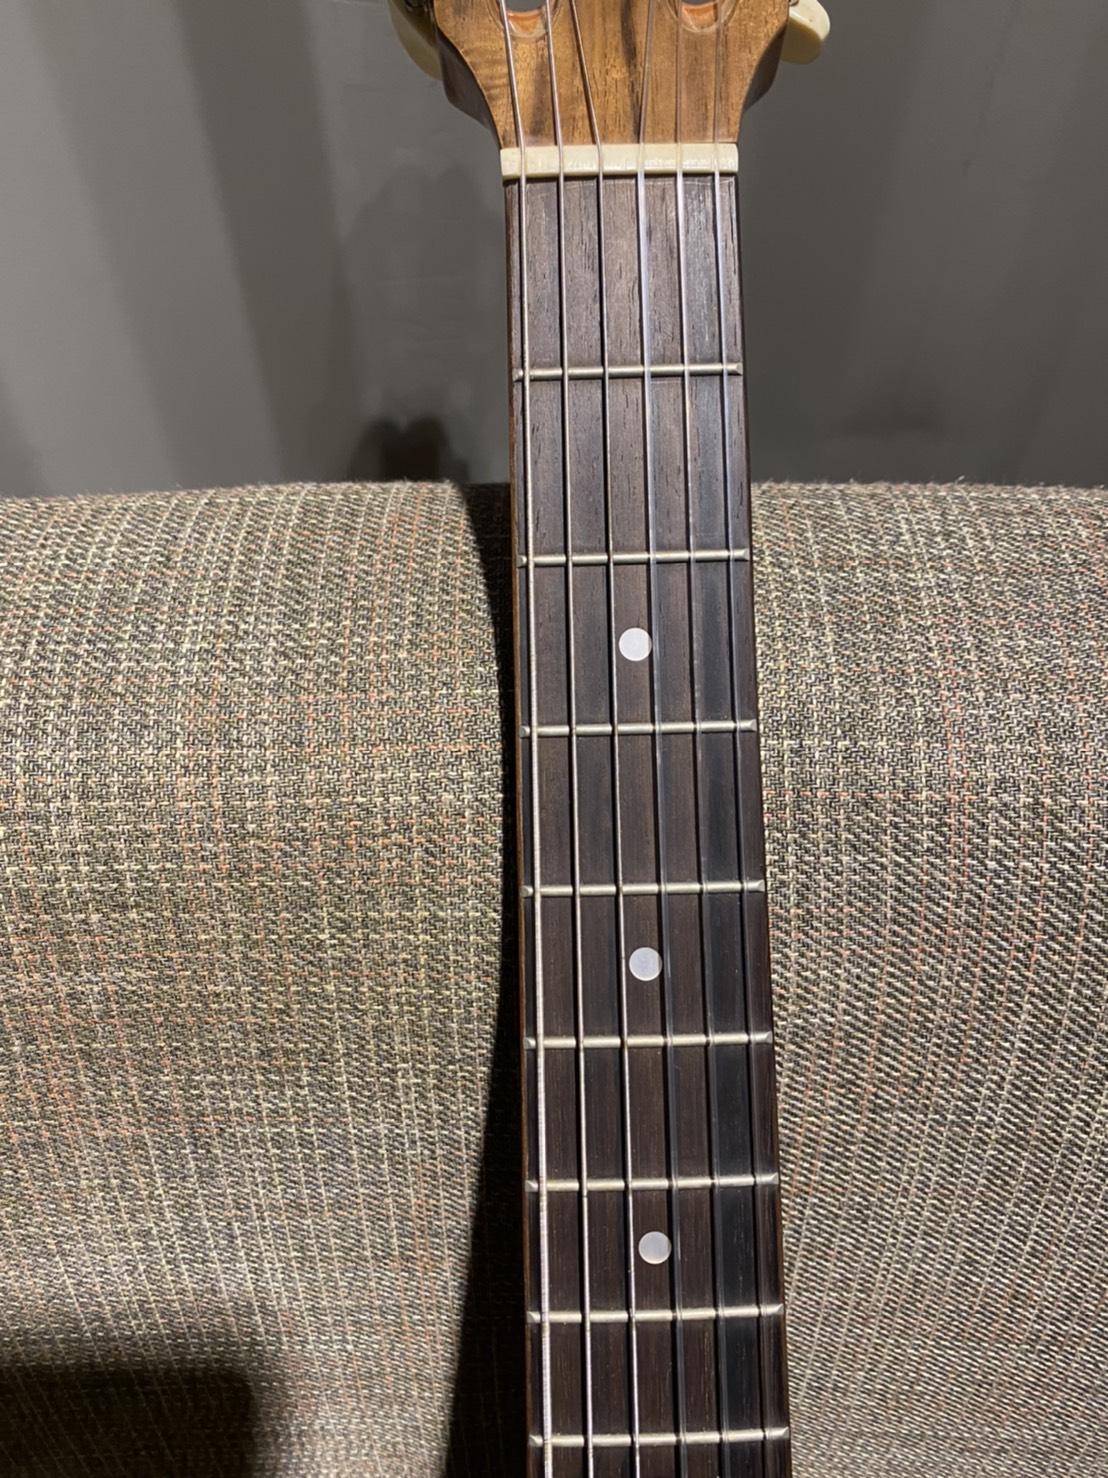 (已售出)跨界古典吉他(14格接桶)Manuel Rodriguez Cross-over Nylon guitar